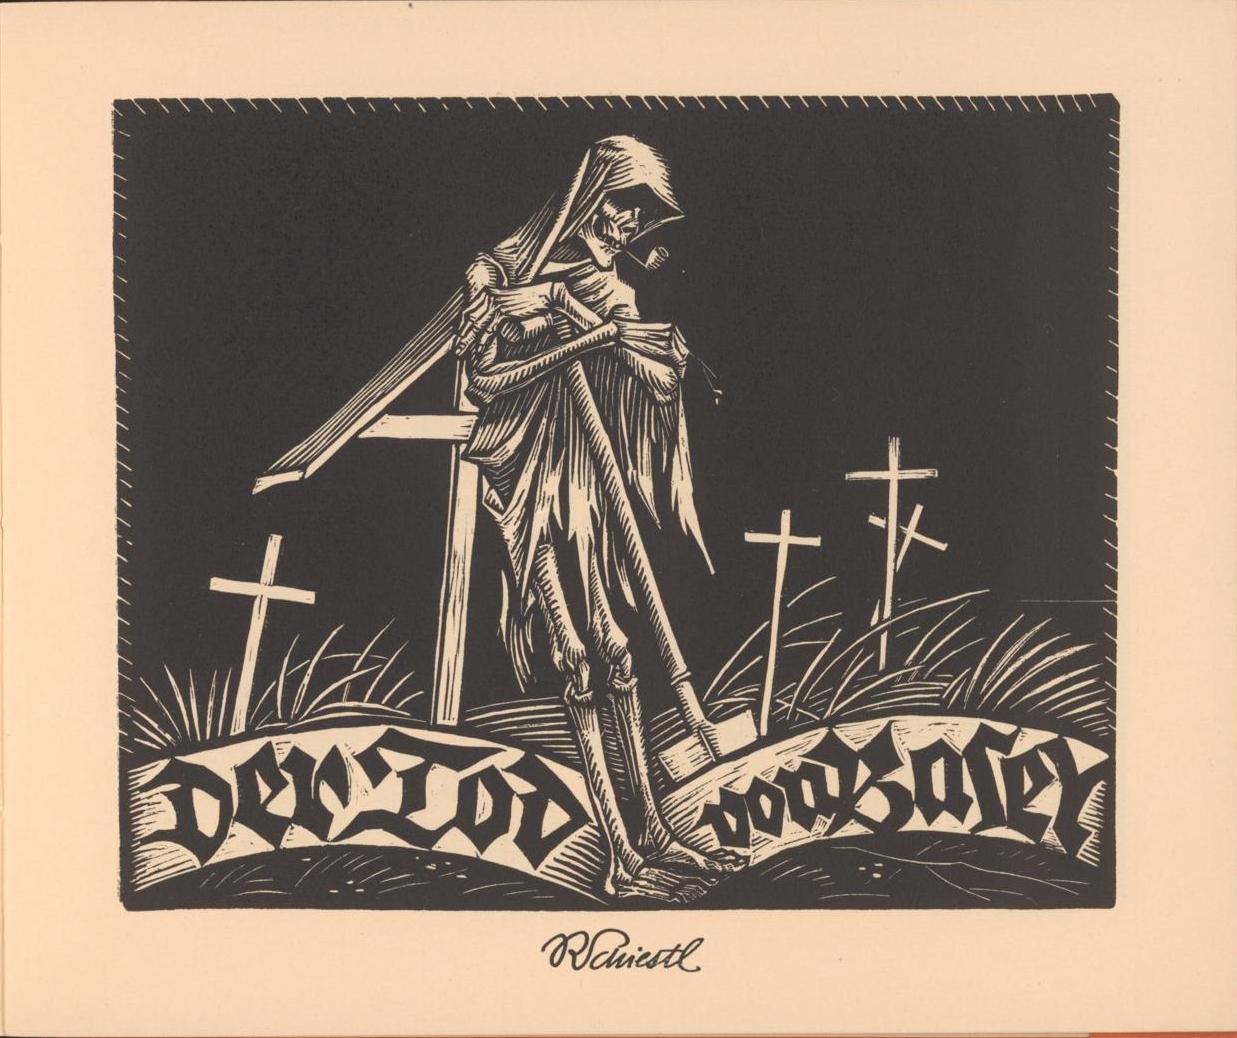 woodcut of danse macabre gravedigger in cemetery